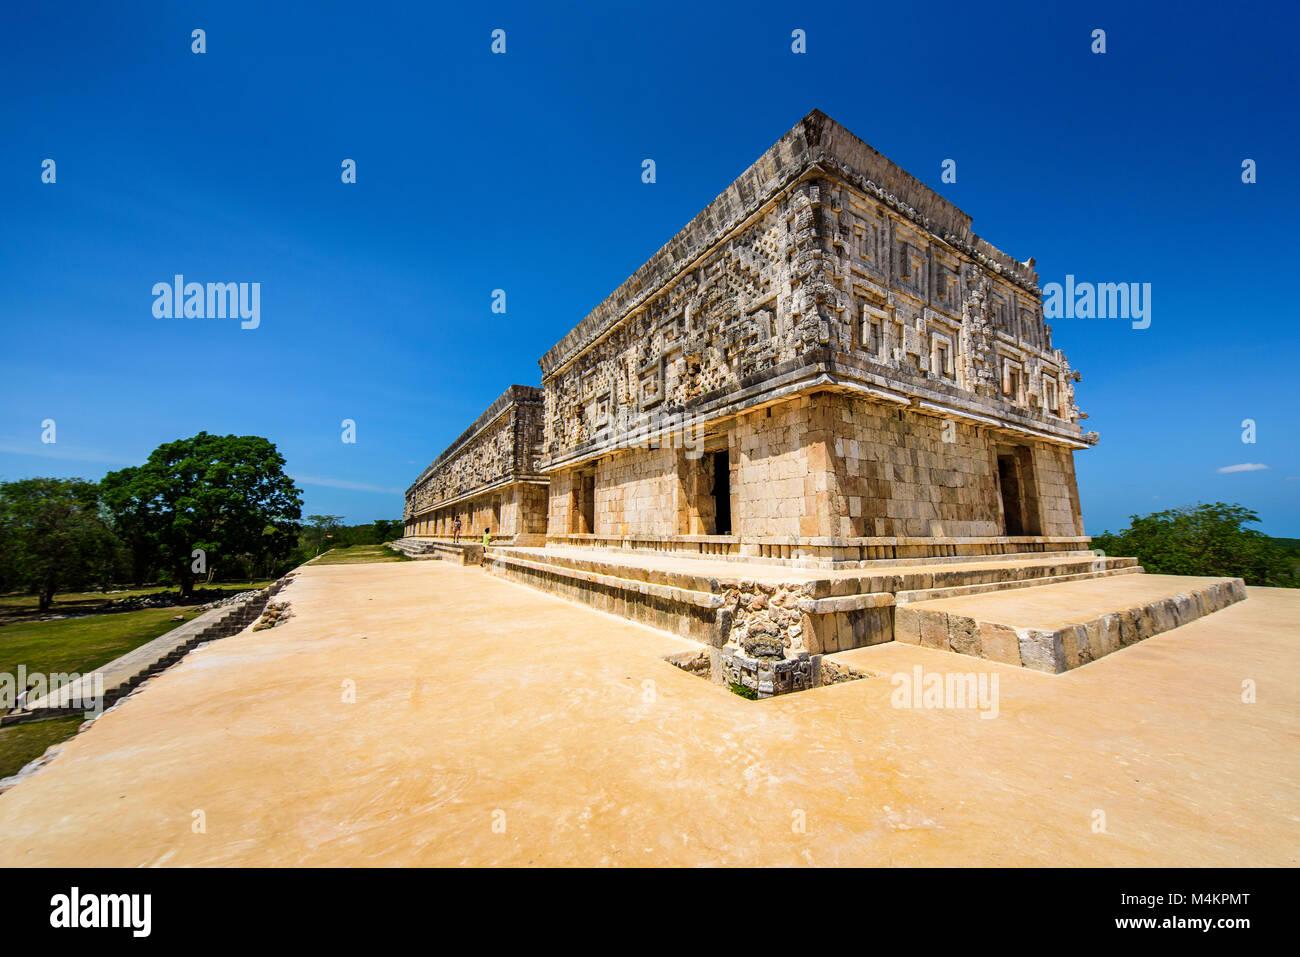 Palacio del Gobernador-Governor's Palace, Maya archeological site Uxmal, Yucatan Province, Mexico, Central America - Stock Image